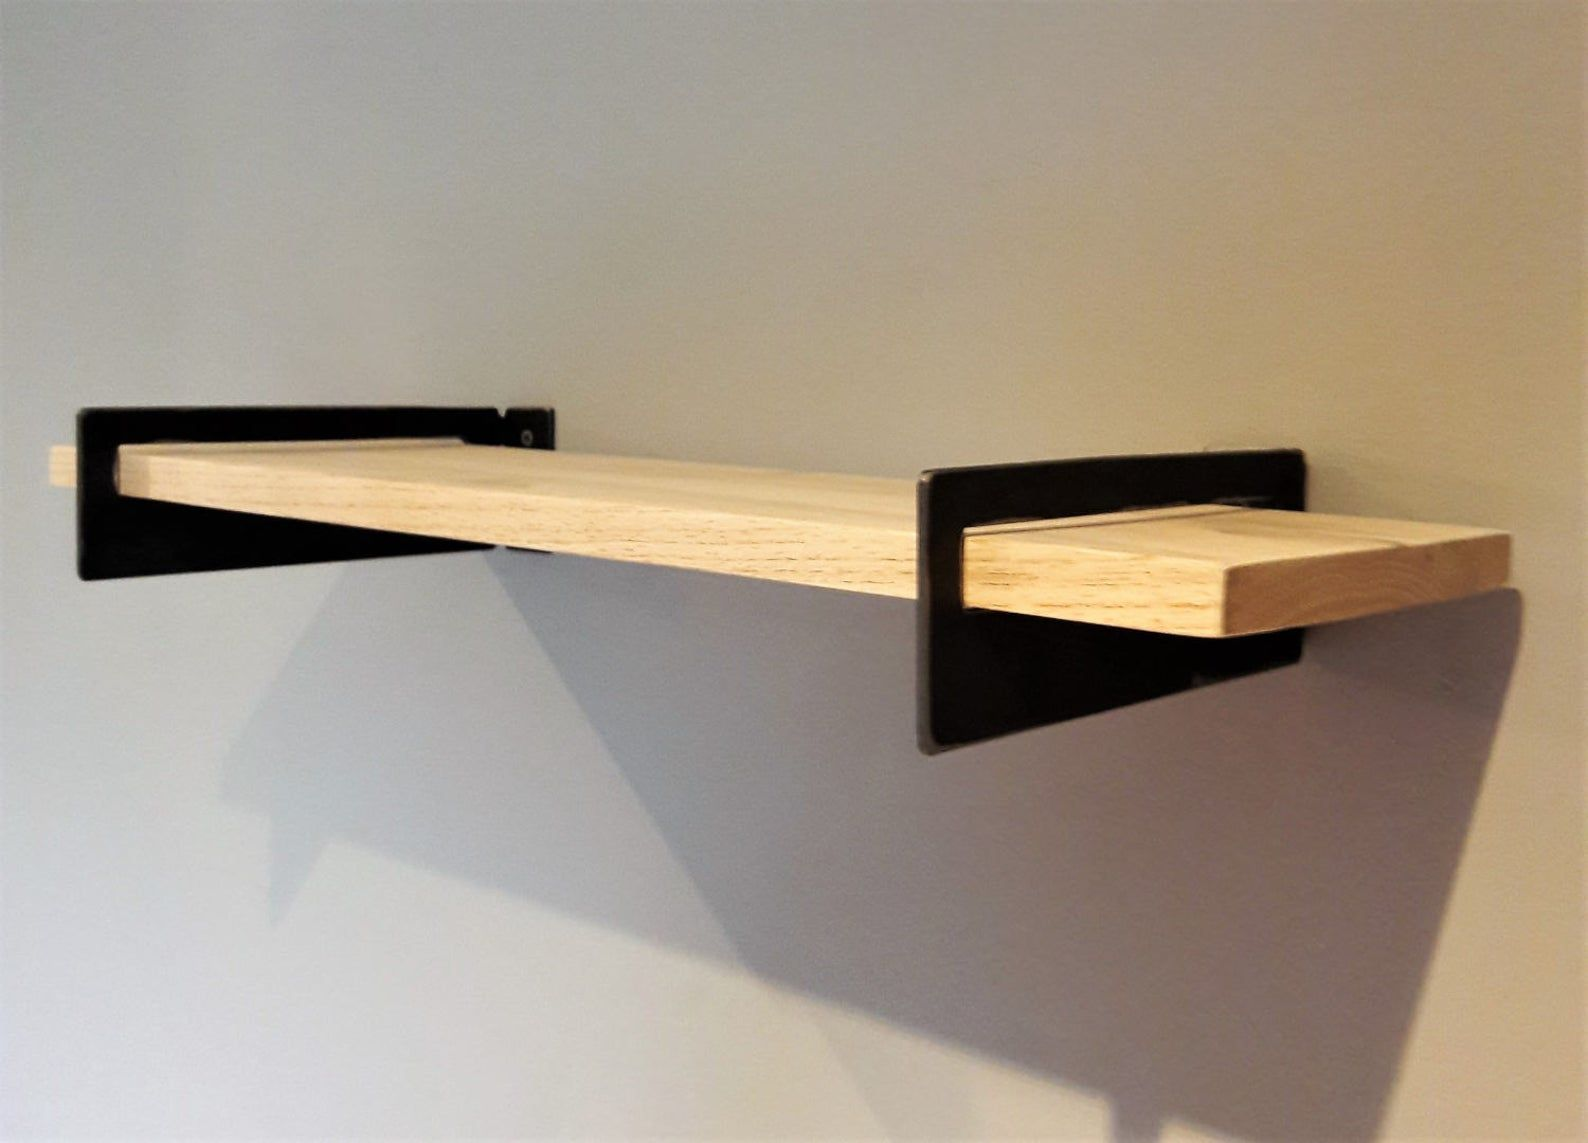 Standard Metal Shelf Brackets 2 Modern Contemporary Etsy In 2020 Metal Shelf Brackets Metal Shelves Geometric Shelves